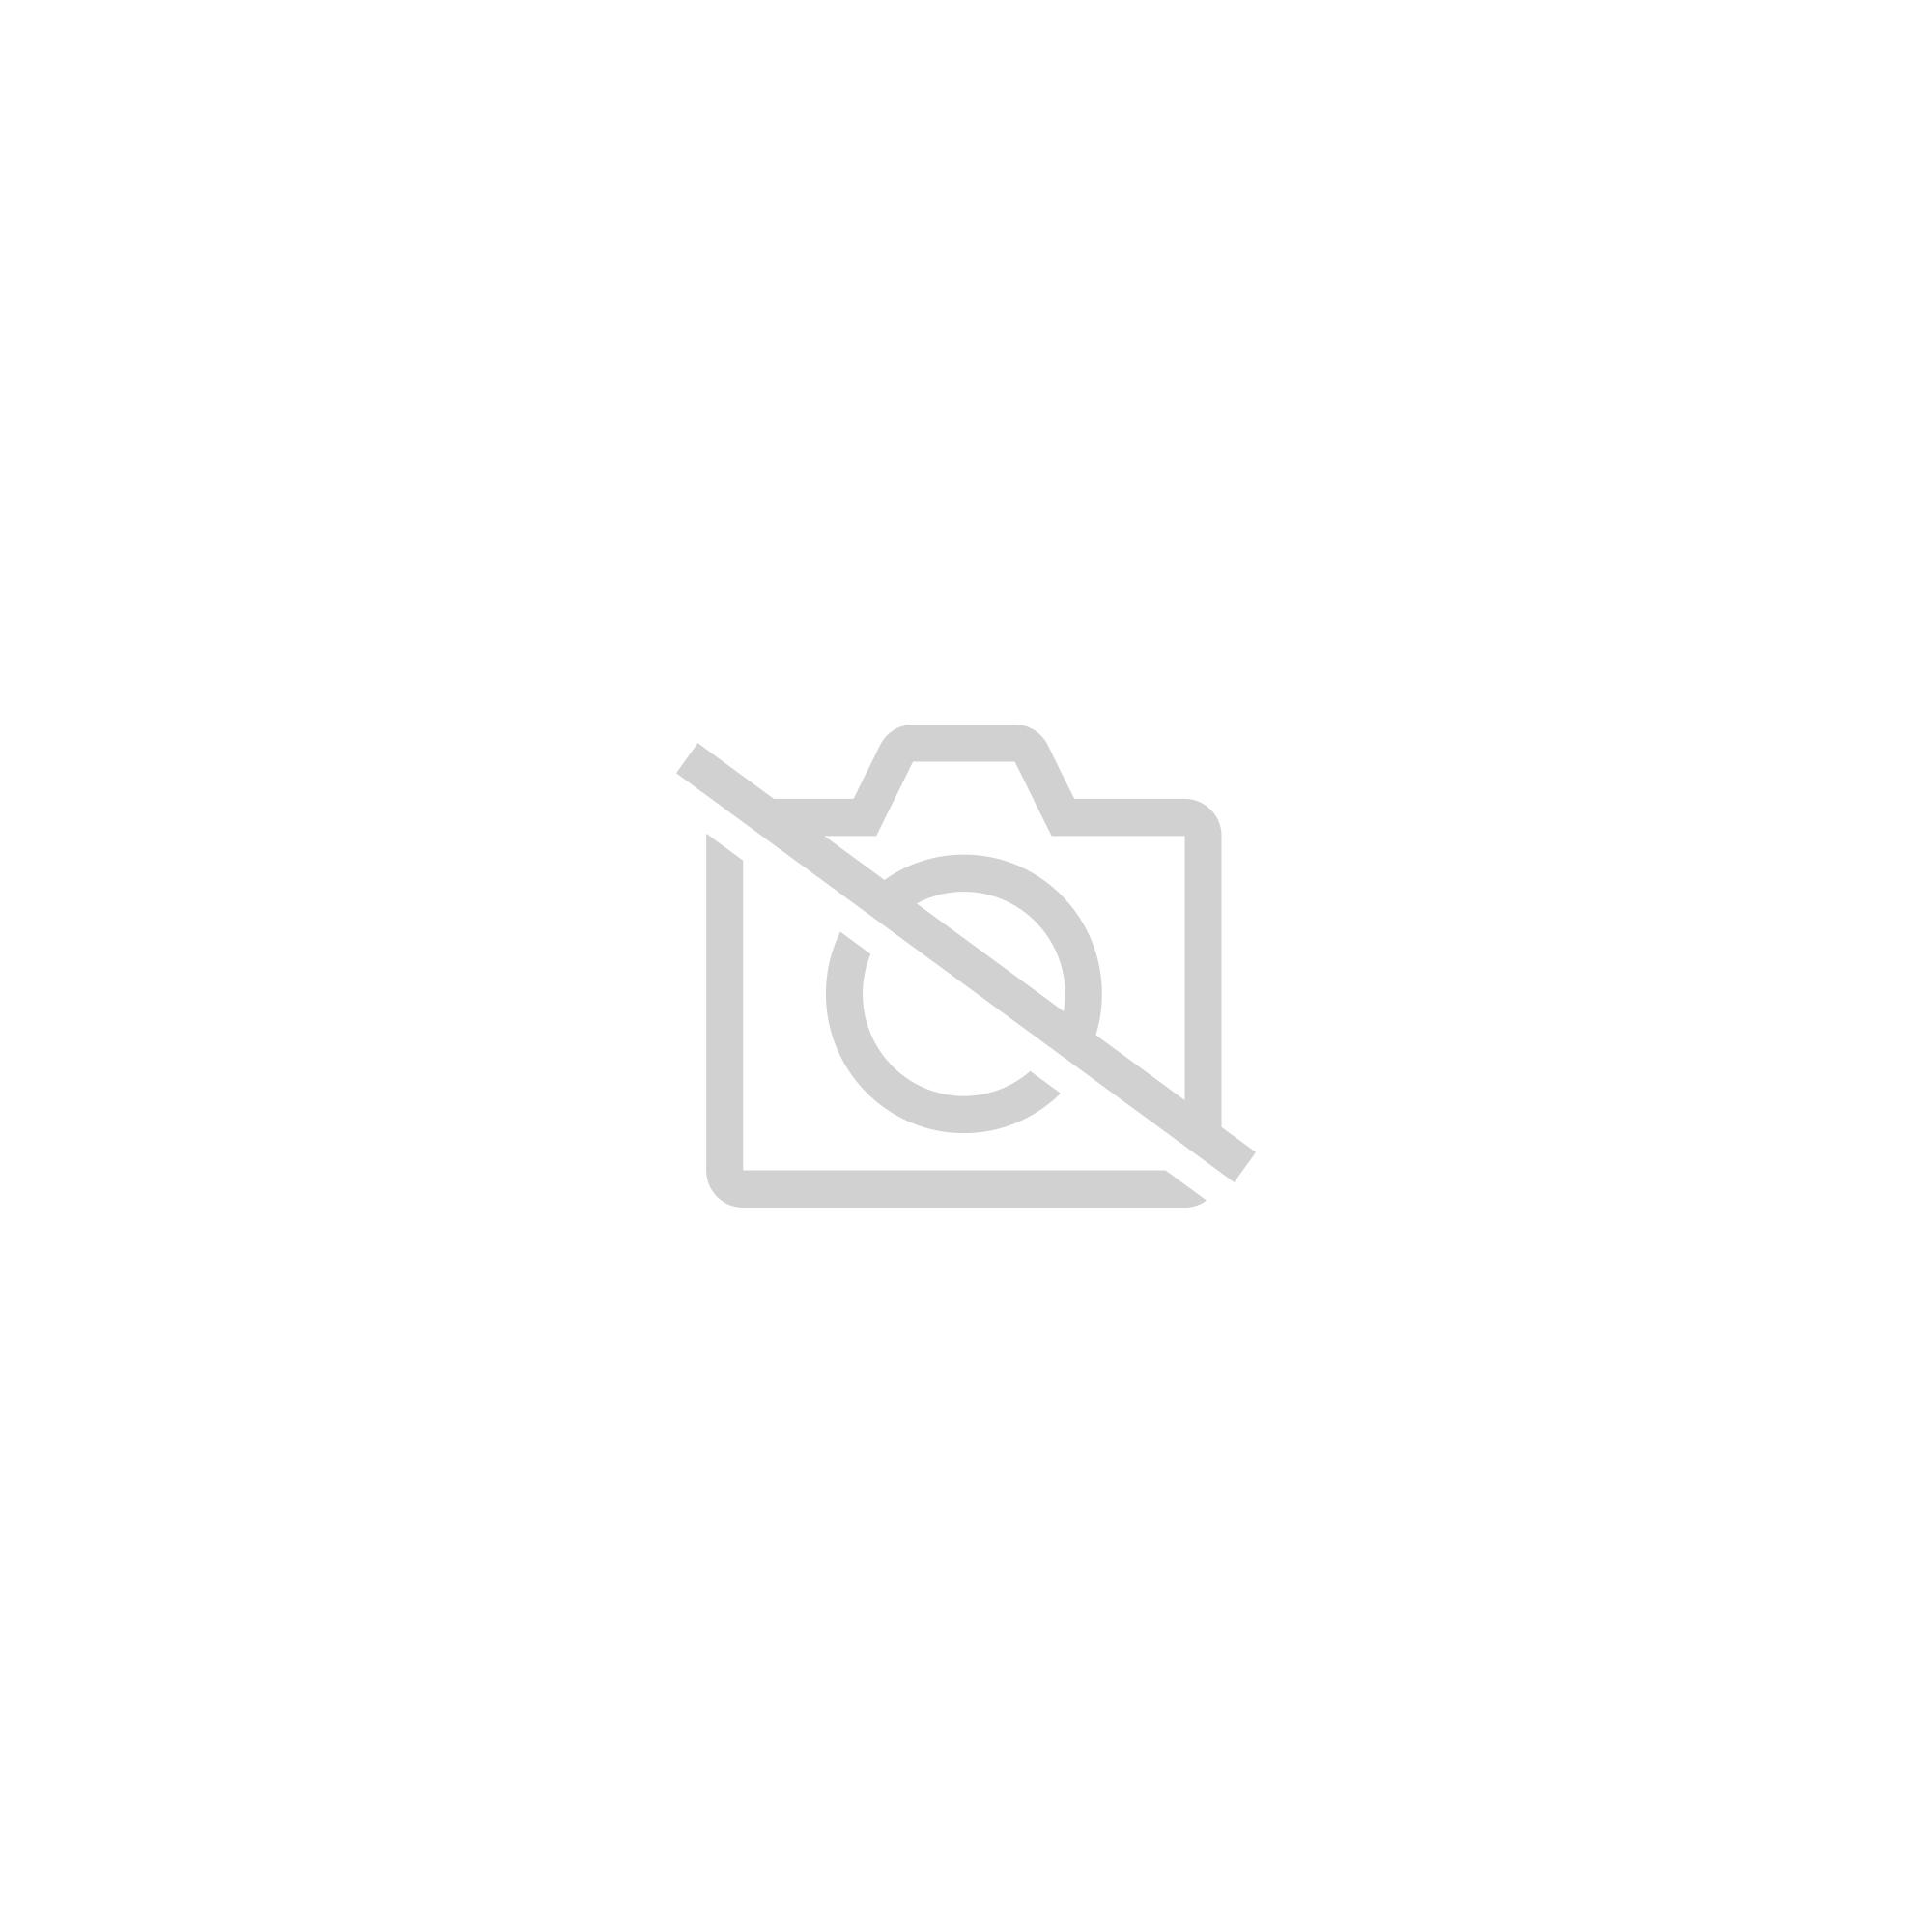 Noir Et Aspirateur Robot Cyclonia Ac1303 Prix : Aspirateur Robot Wish Avis